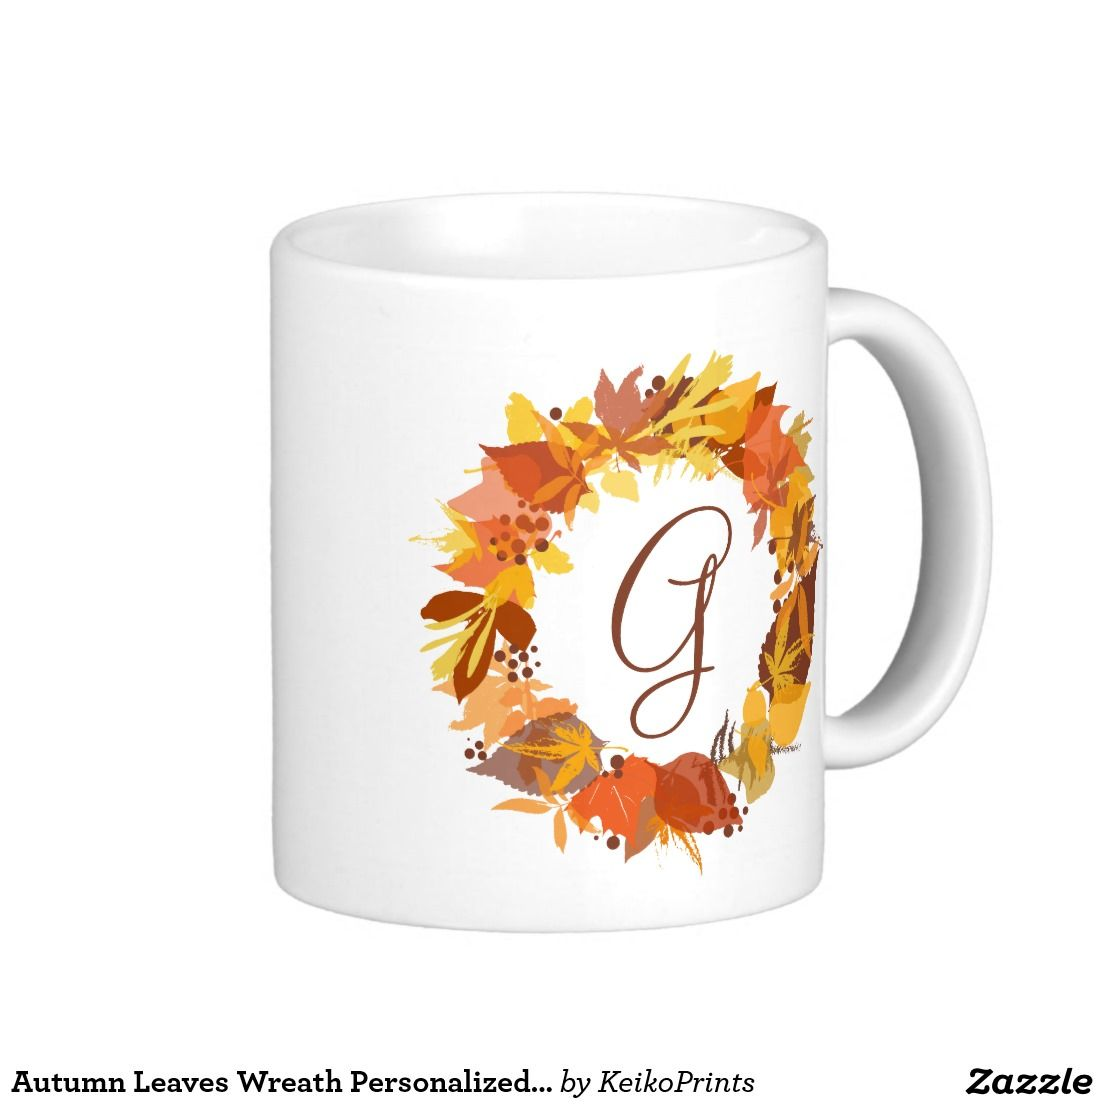 Autumn Leaves Wreath Personalized Monogram Mug  Mugs Cups and